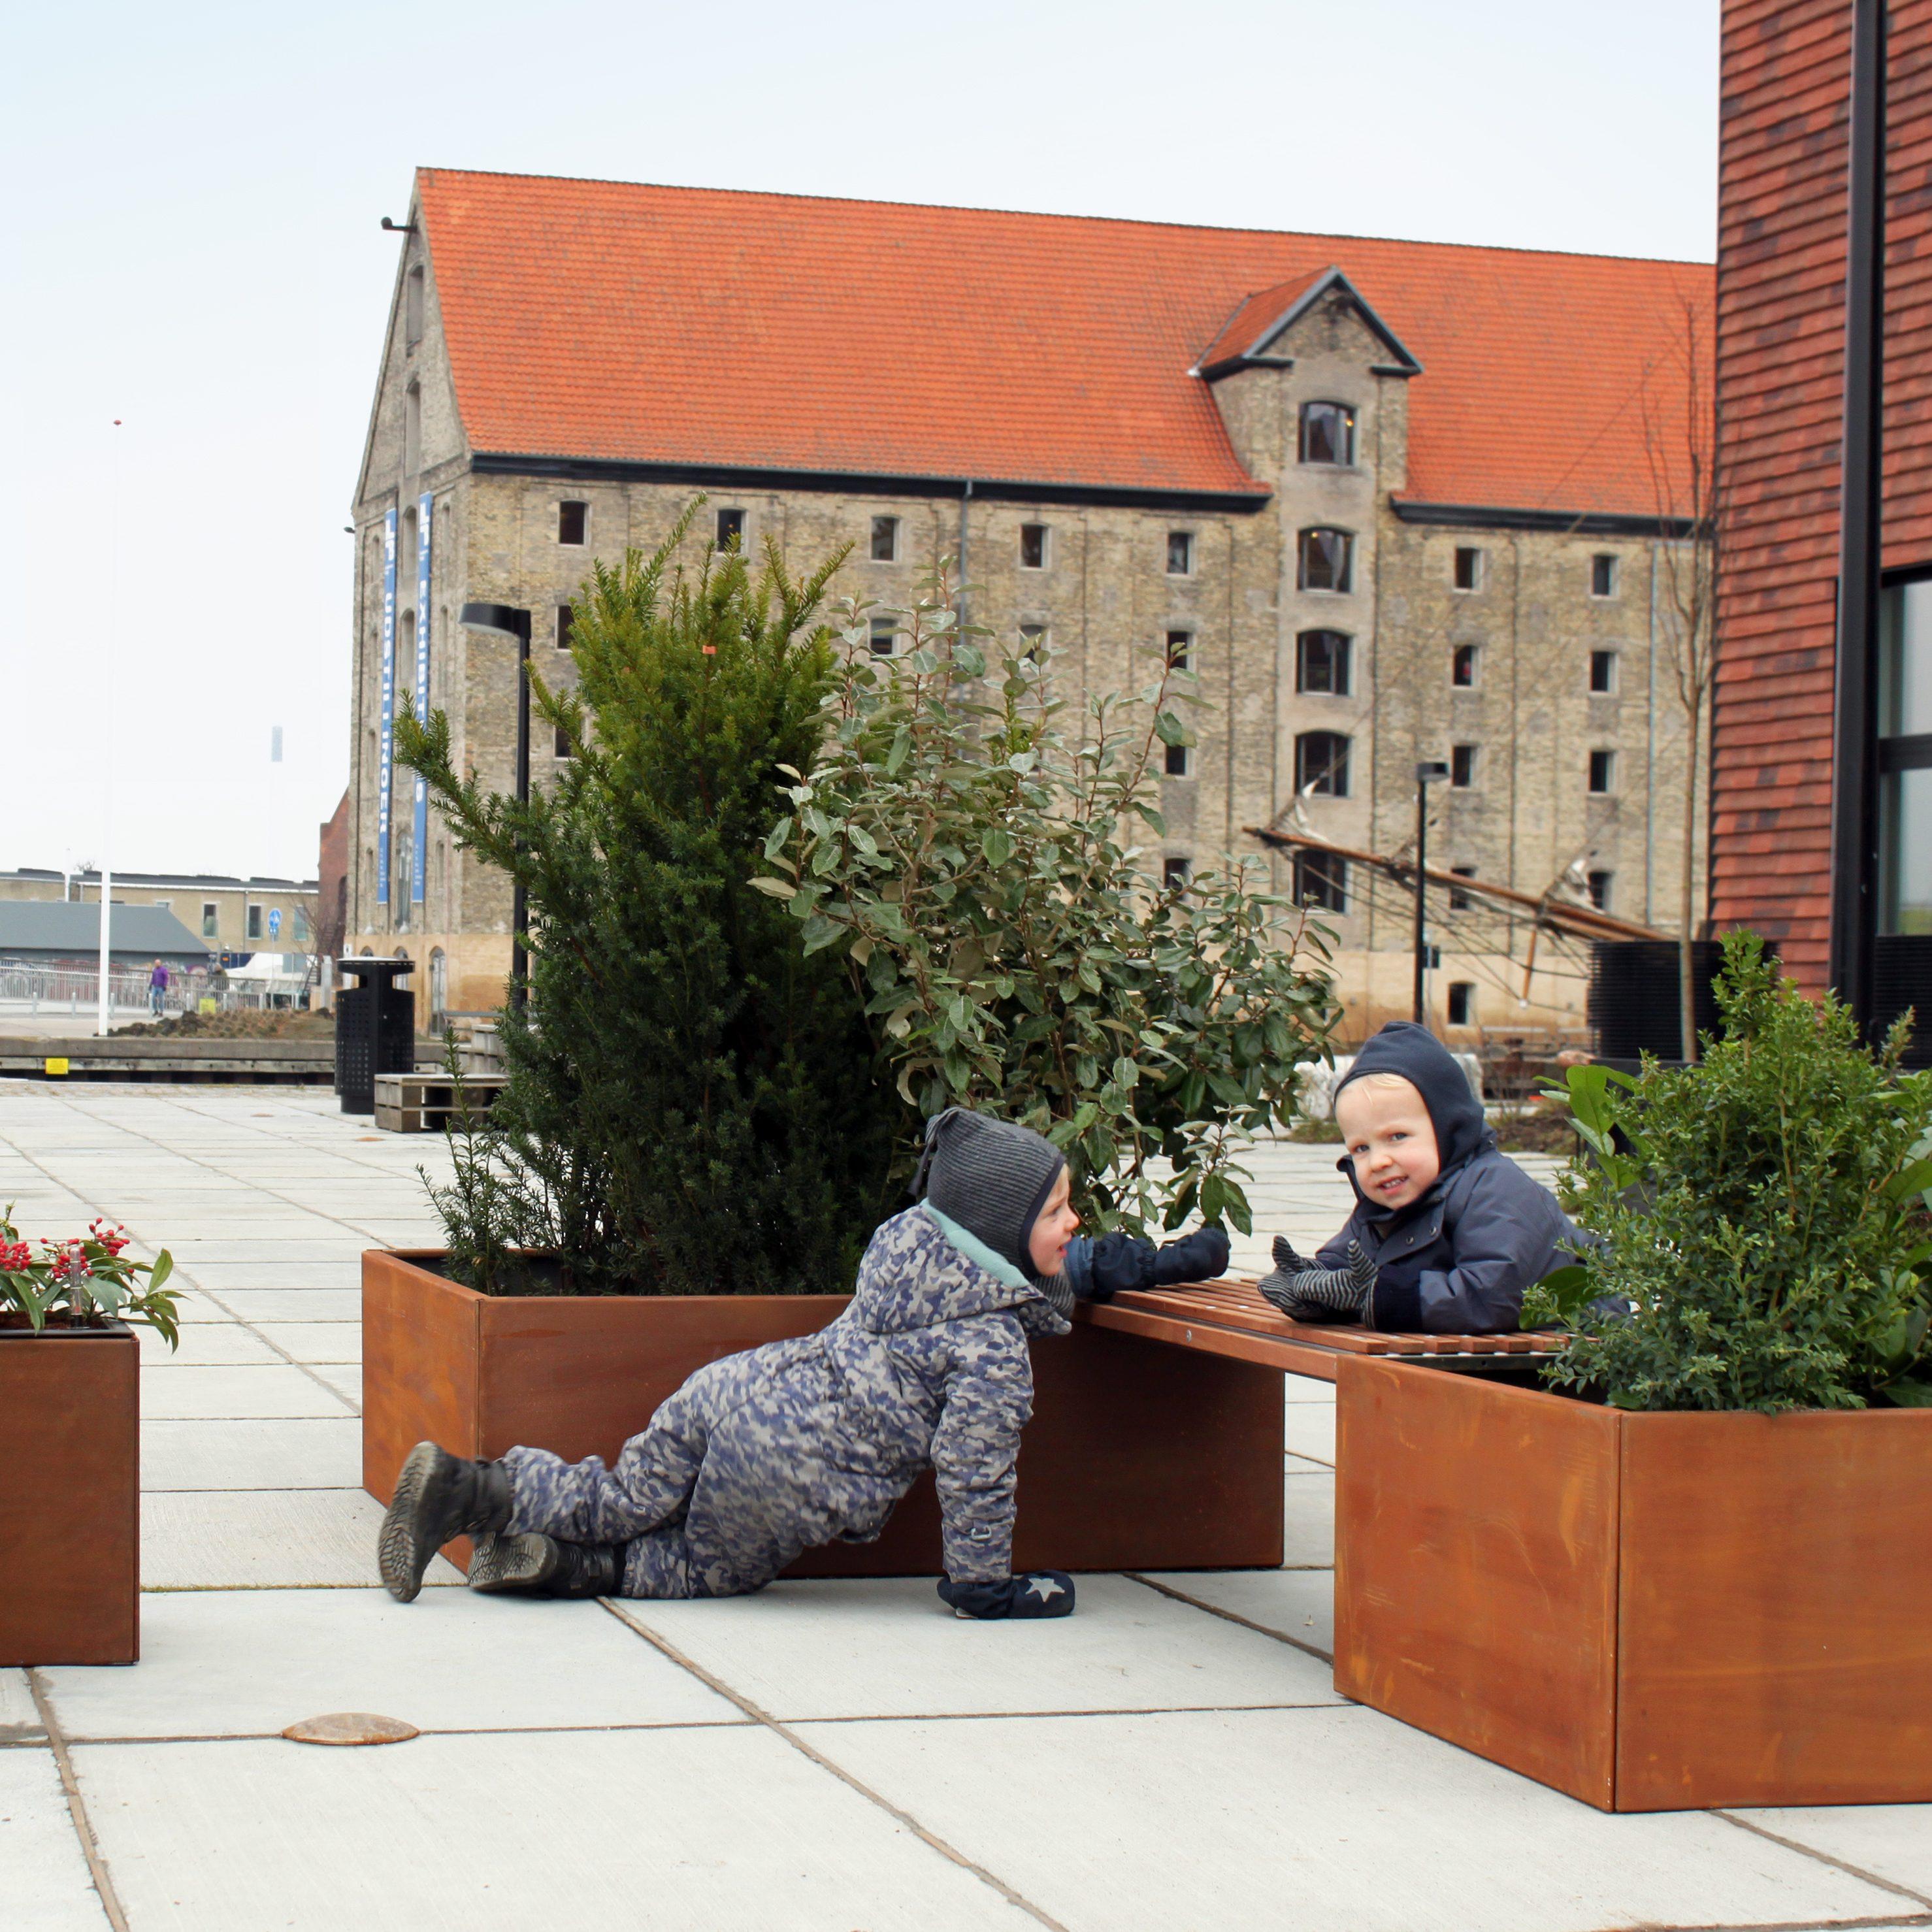 land modern quadratische pflanzk bel. Black Bedroom Furniture Sets. Home Design Ideas